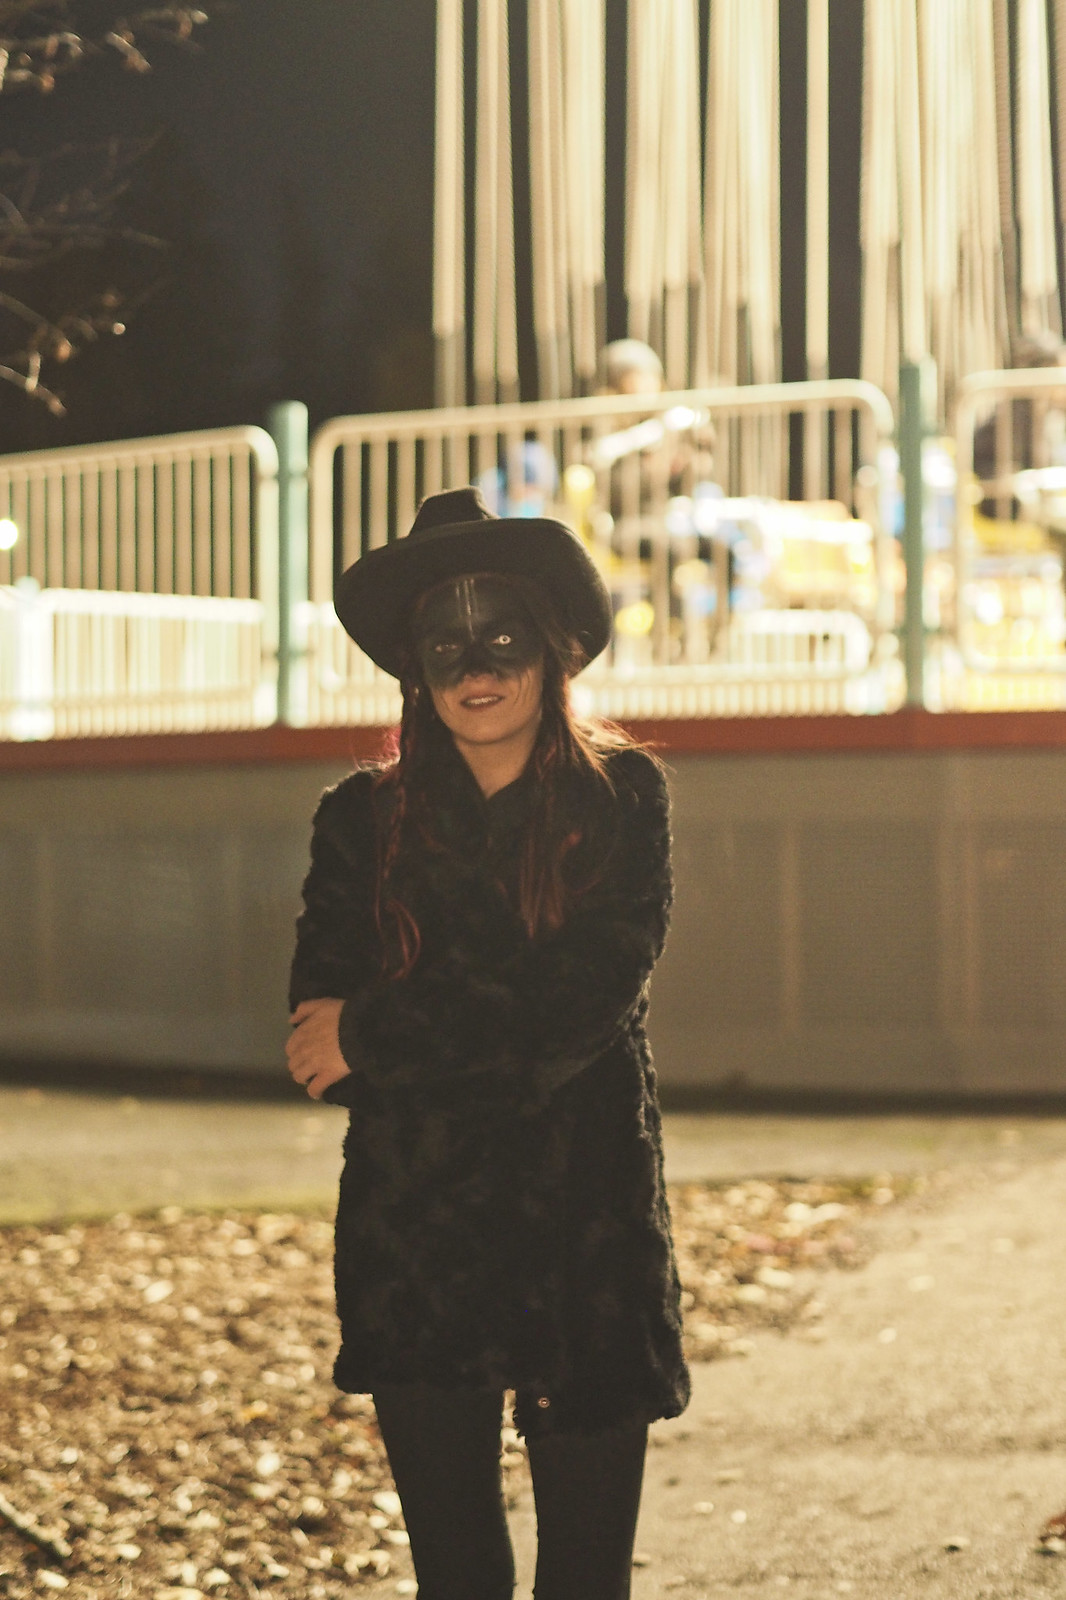 voodoo cowgirl